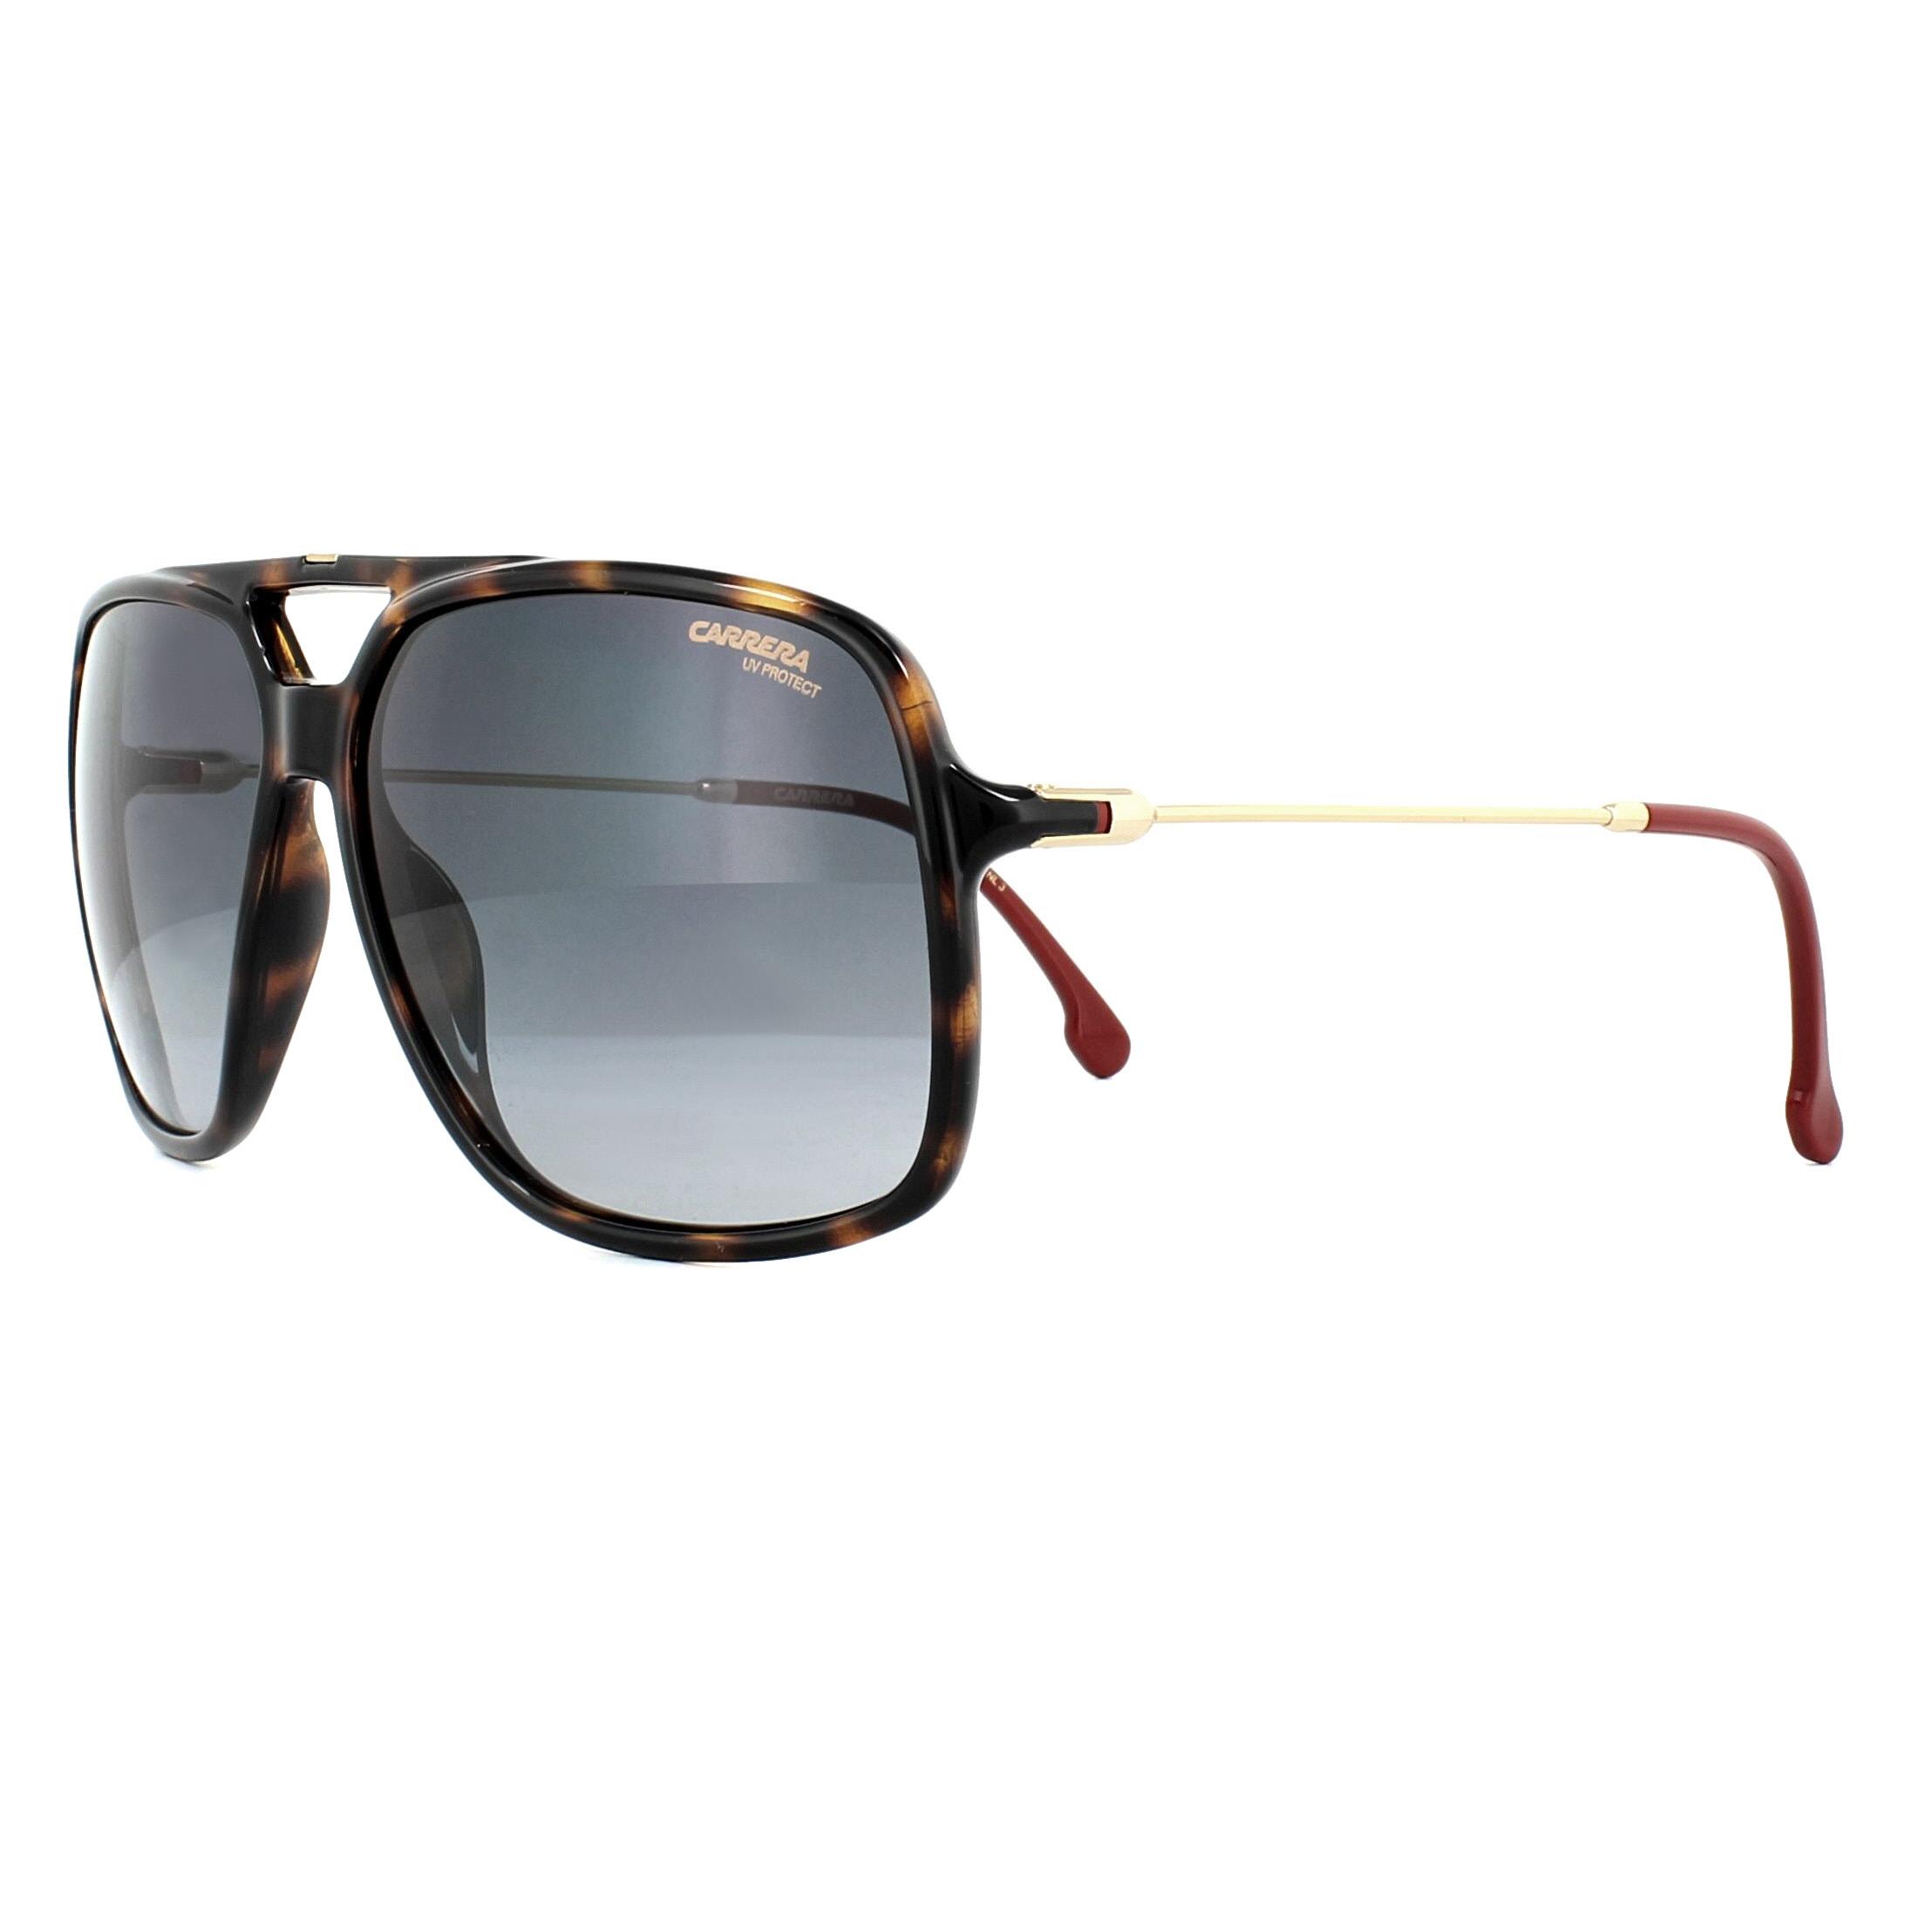 Sentinel Carrera Sunglasses 155 S 086 9O Havana Gold Grey d3b81b970785